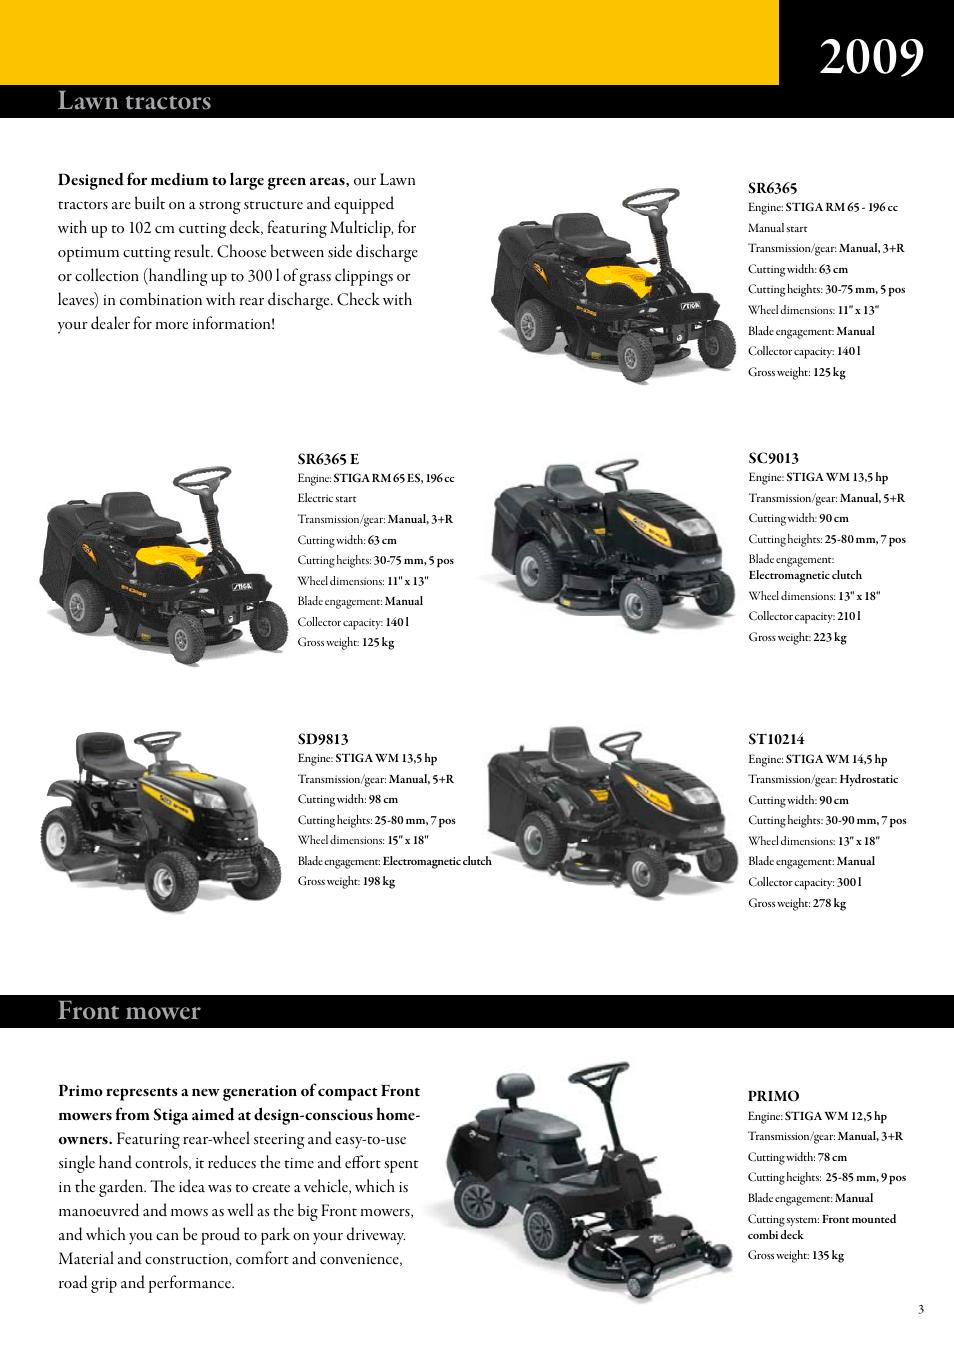 Lawn tractors, Front mower | Stiga Lawn tractors User Manual | Page 3 / 8